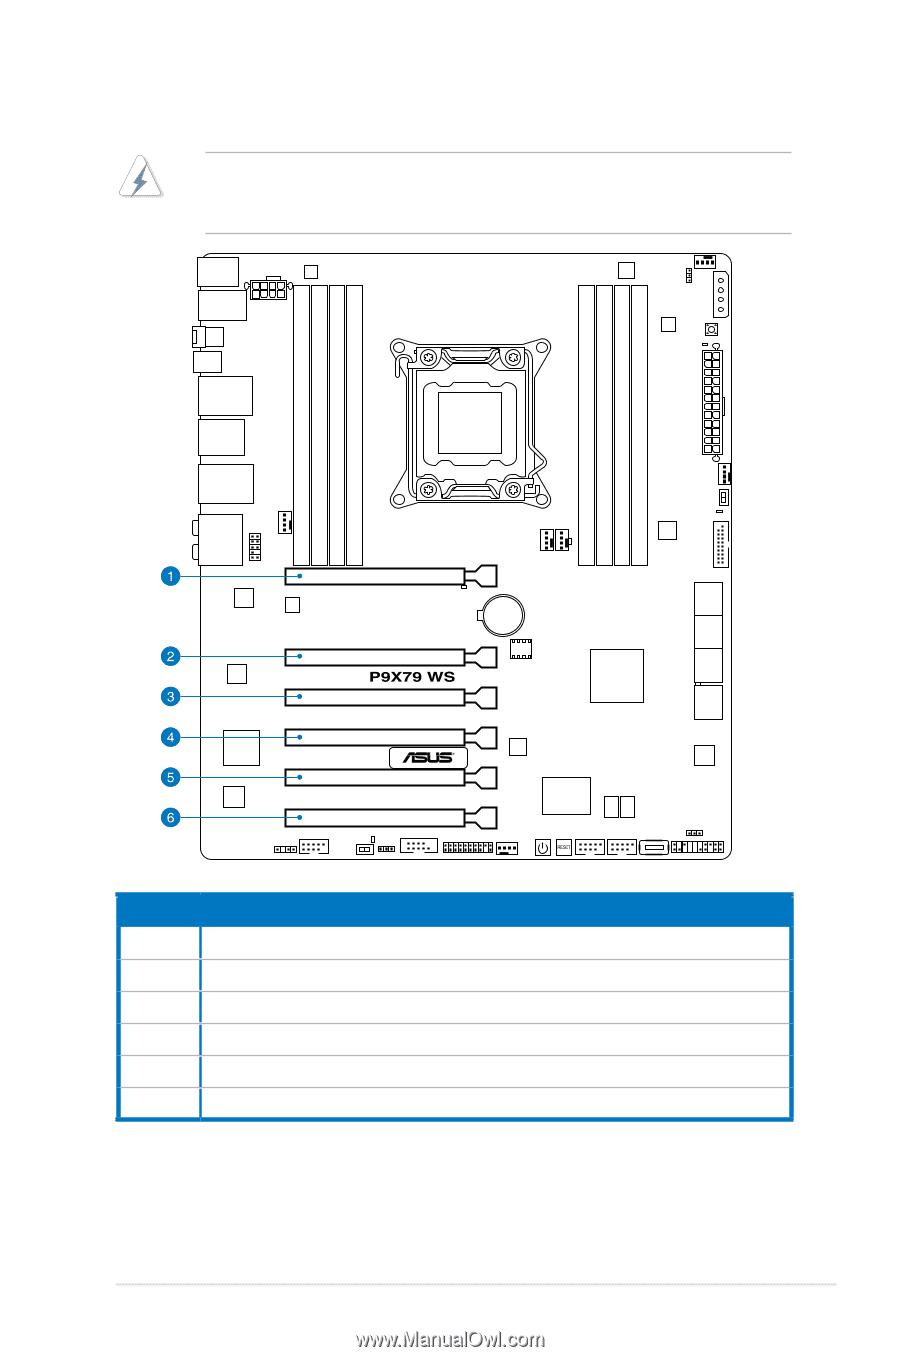 Asus P9X79 WS | User Manual - Page 42